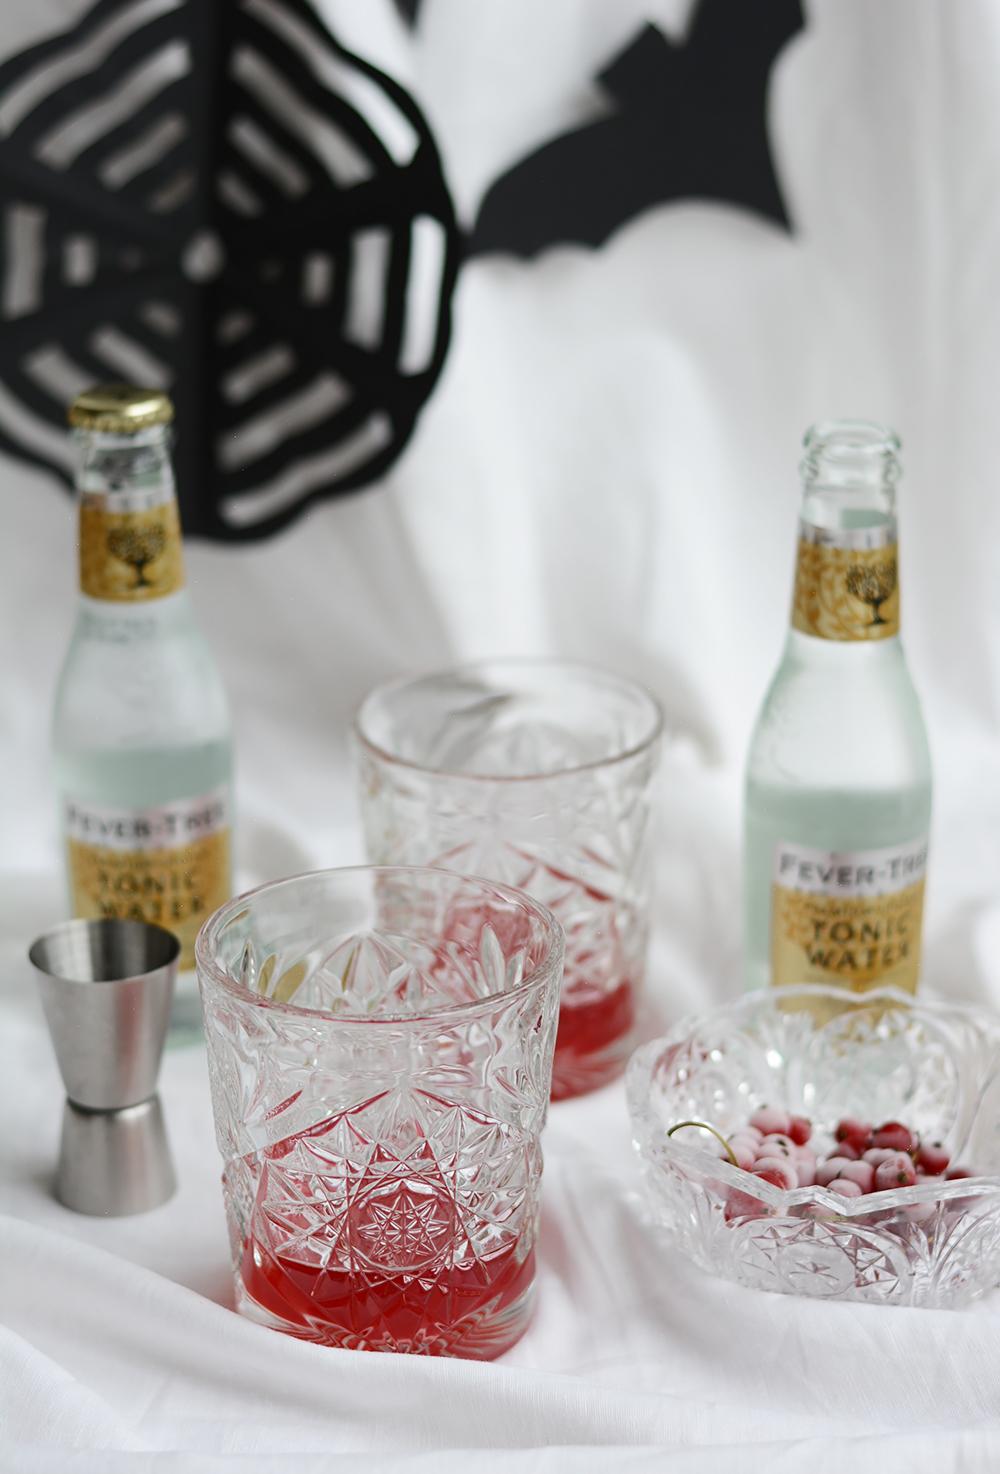 Ribisel-Gin-Tonic Zutaten | we love handmade